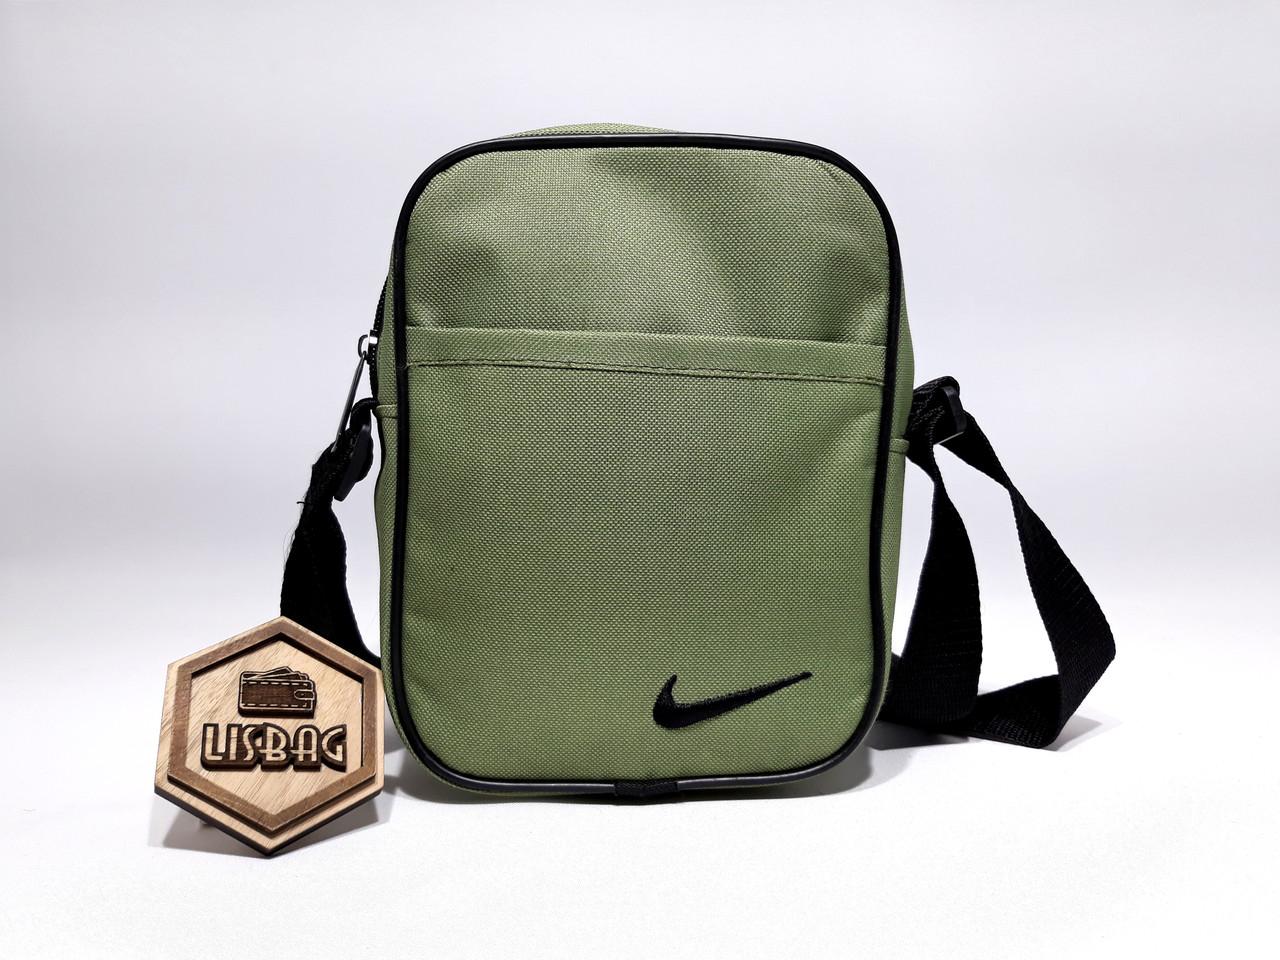 b6d3fcf8b922 ... Мужская сумка планшетка/мессенджер через плечо Nike копия, Оливковая,  фото 4 ...